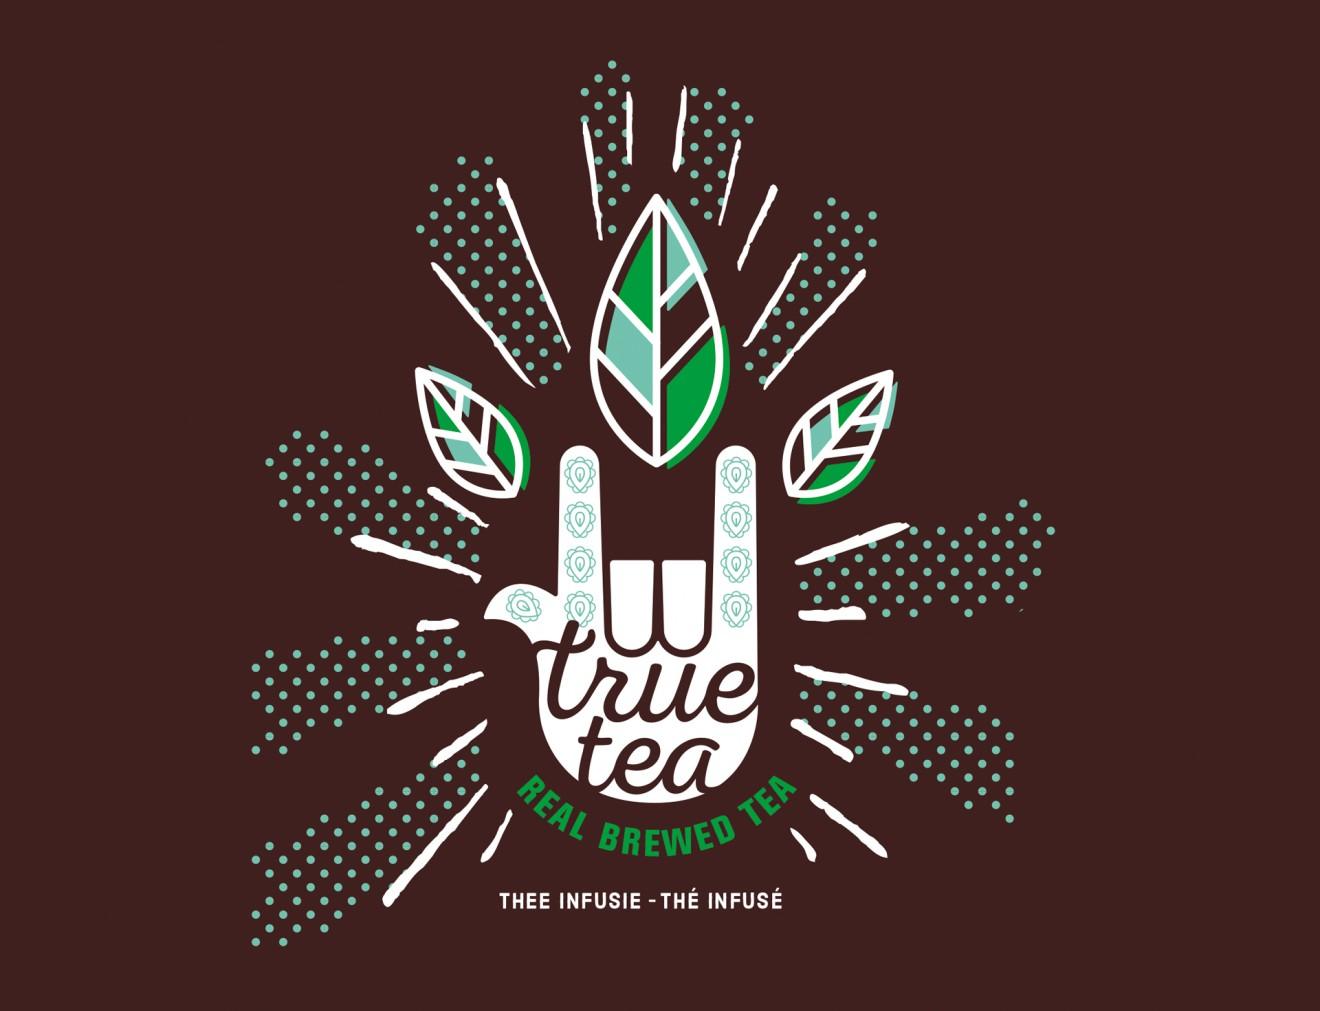 Quatre Mains package design - cold brewed, teas, delhaize, branding